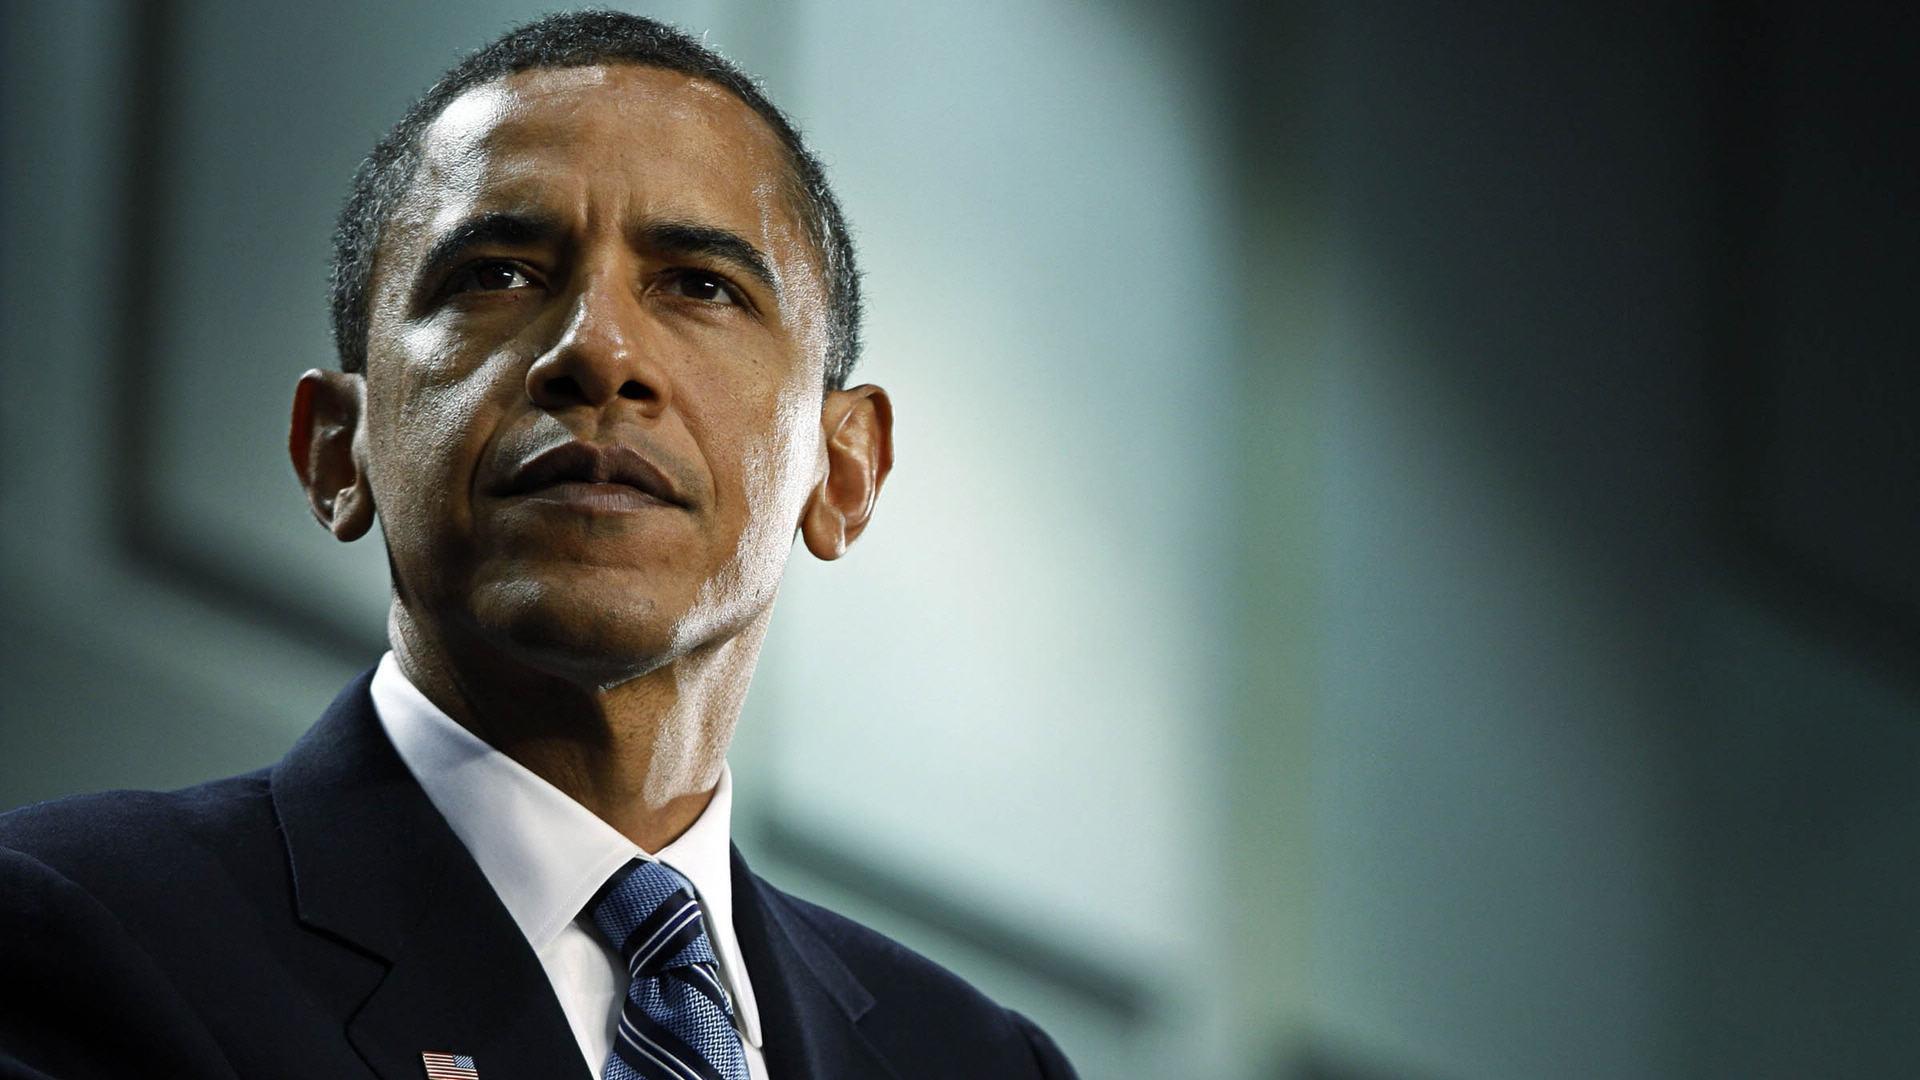 Barack Obama Wallpapers Hd